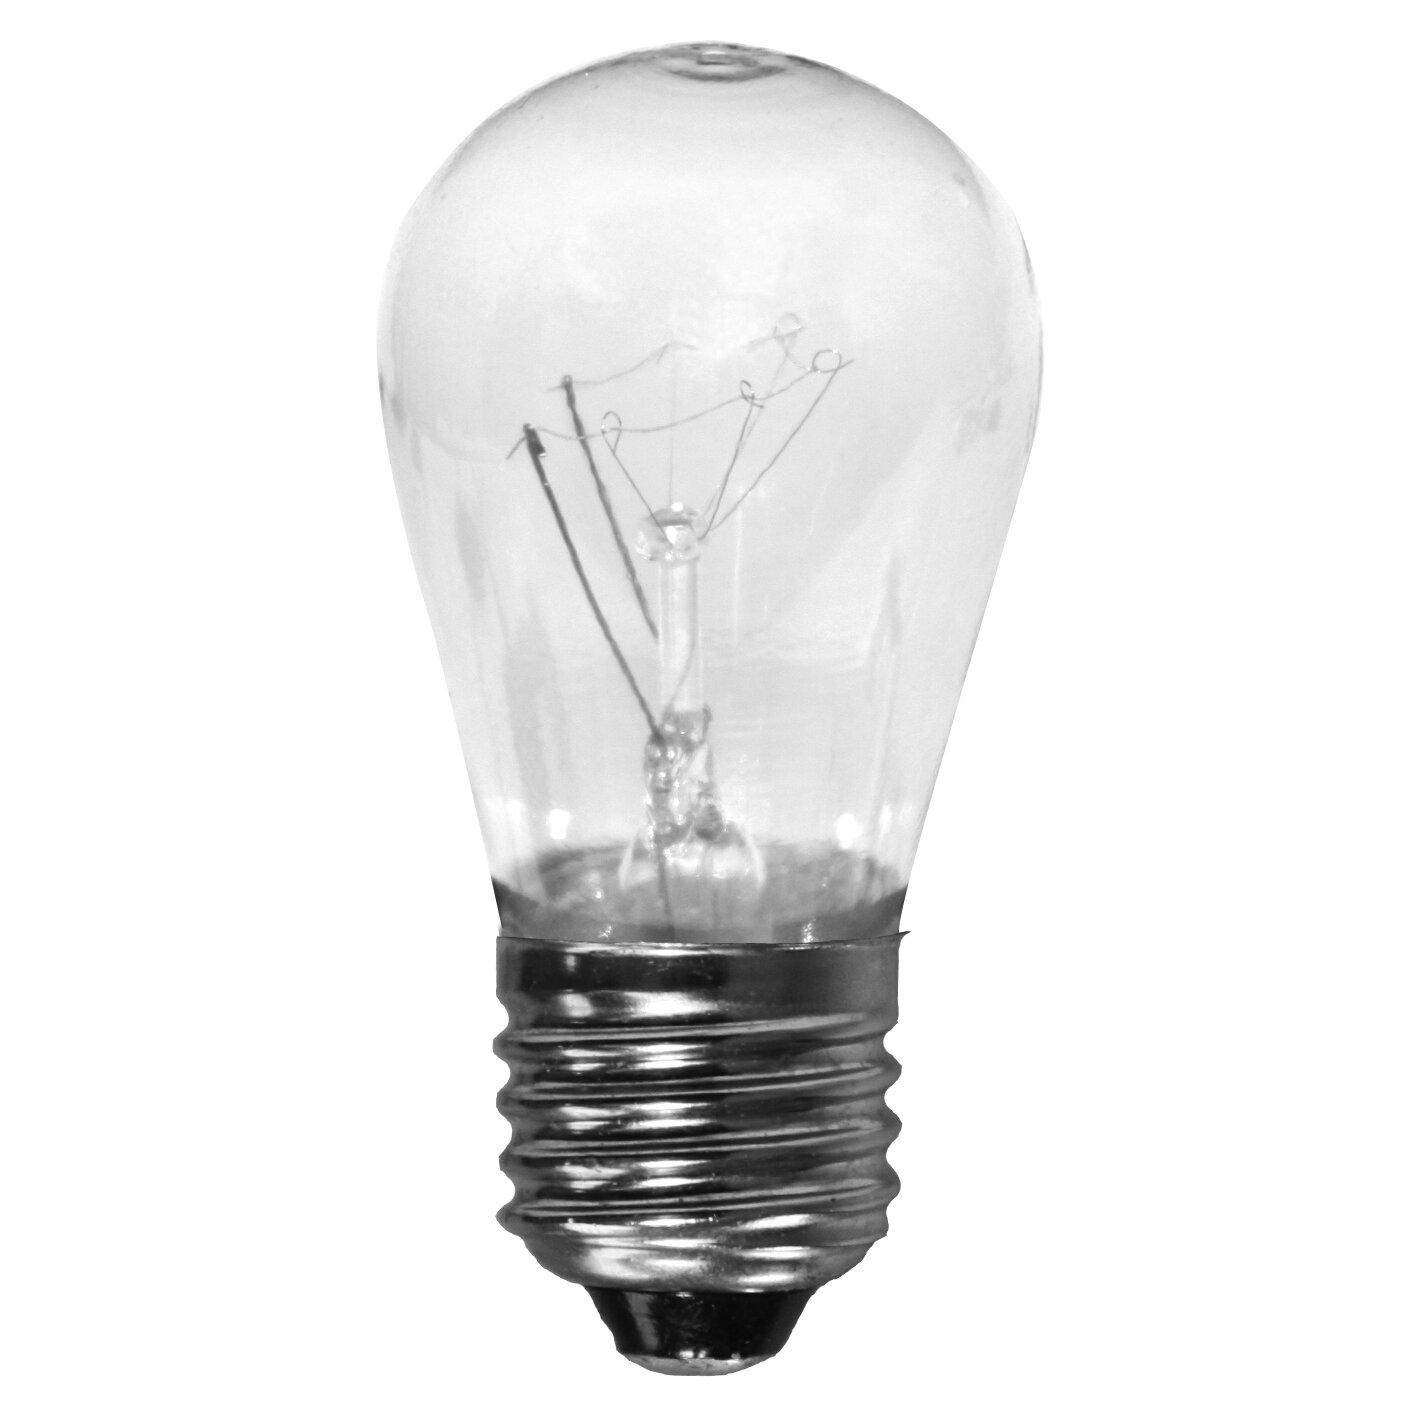 American Lighting LLC 11W 130 Volt 2700K Incandescent Light Bulb Revi